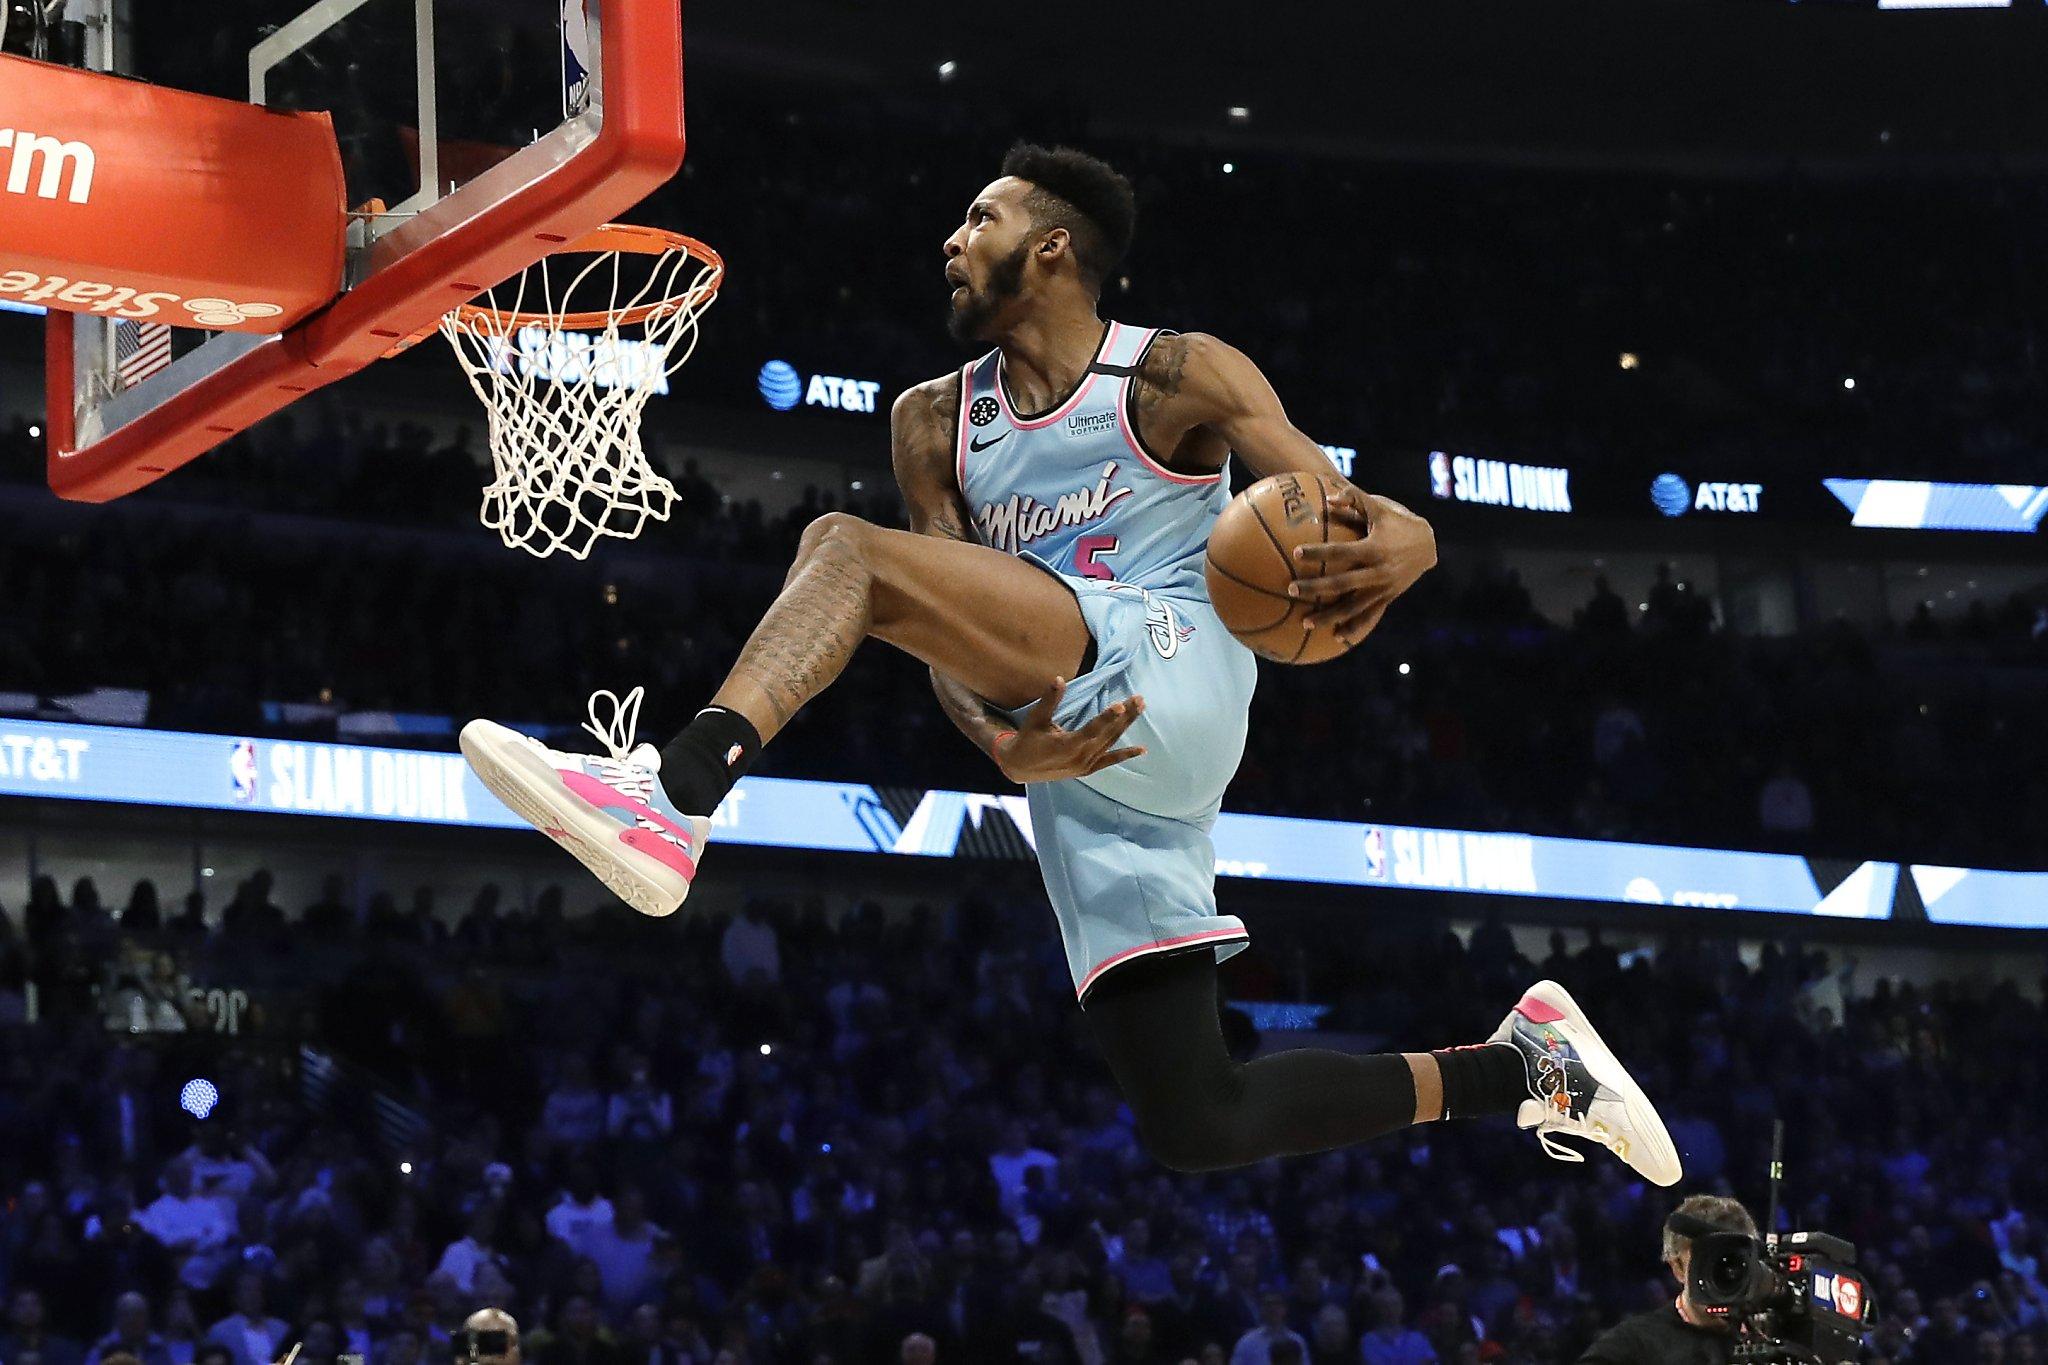 Derrick Jones Jr. tops Aaron Gordon for dunk crown on All-Star Saturday